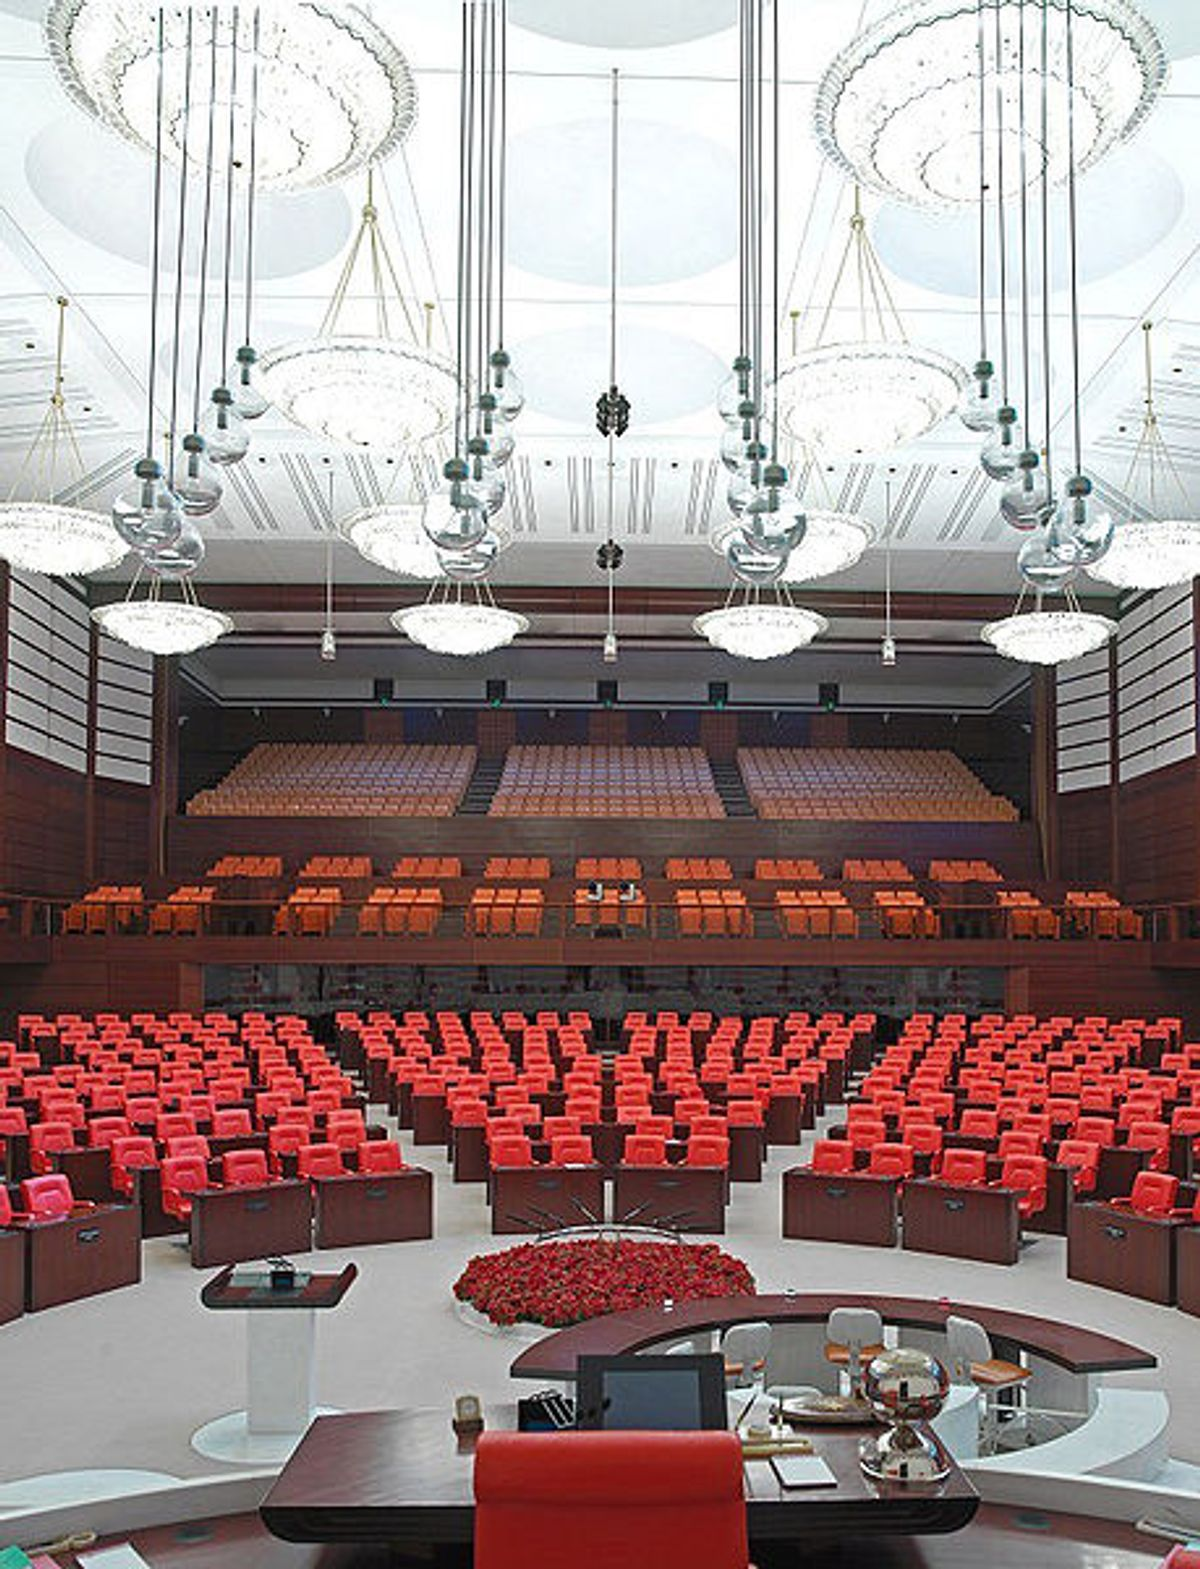 Inside of the Turkish Parliament in capital city Ankara